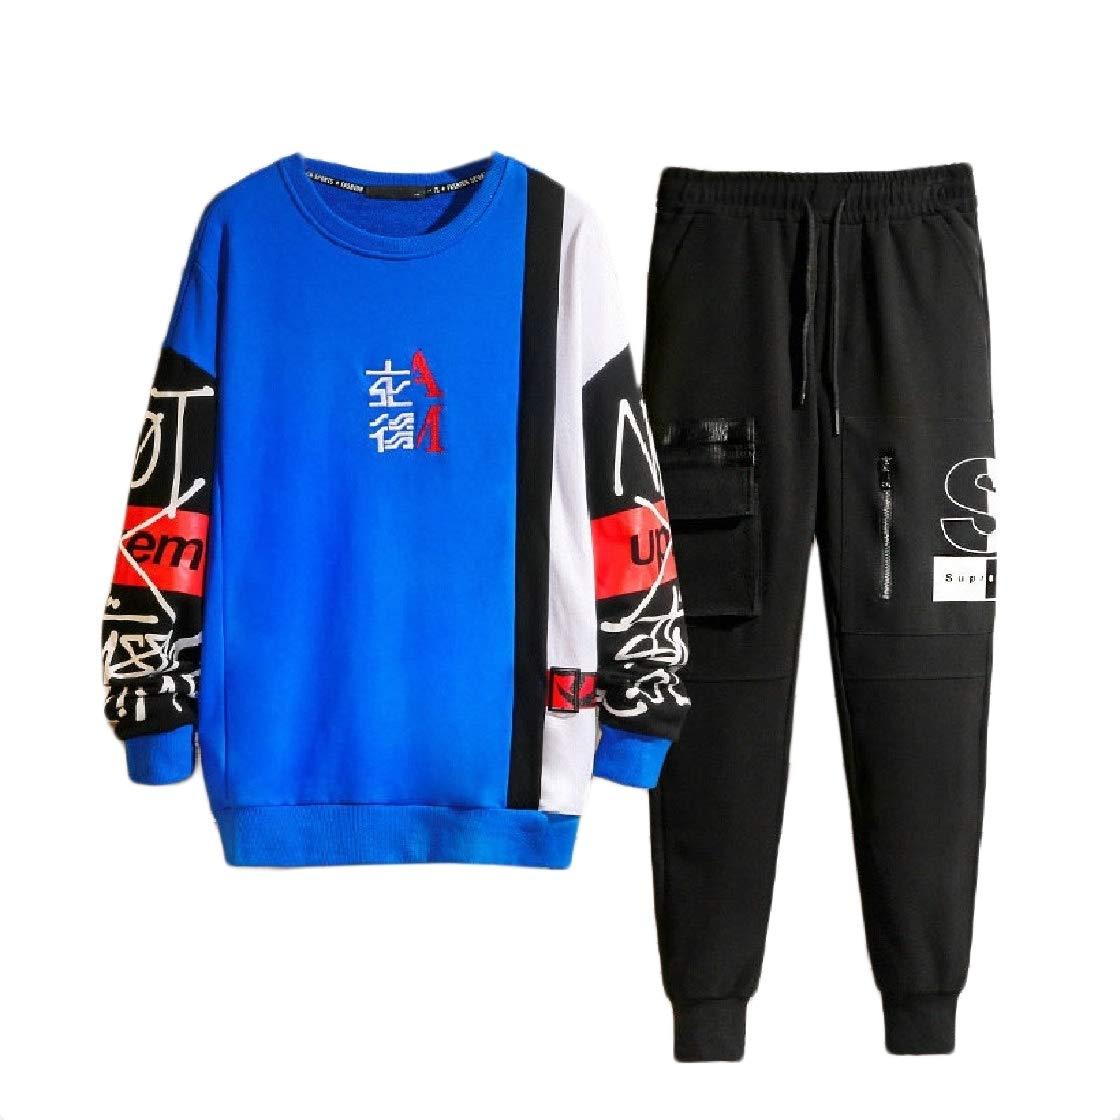 DressUMen Zipper Contrast Color 2 Piece Activewear Printing Sweatsuits Tracksuits